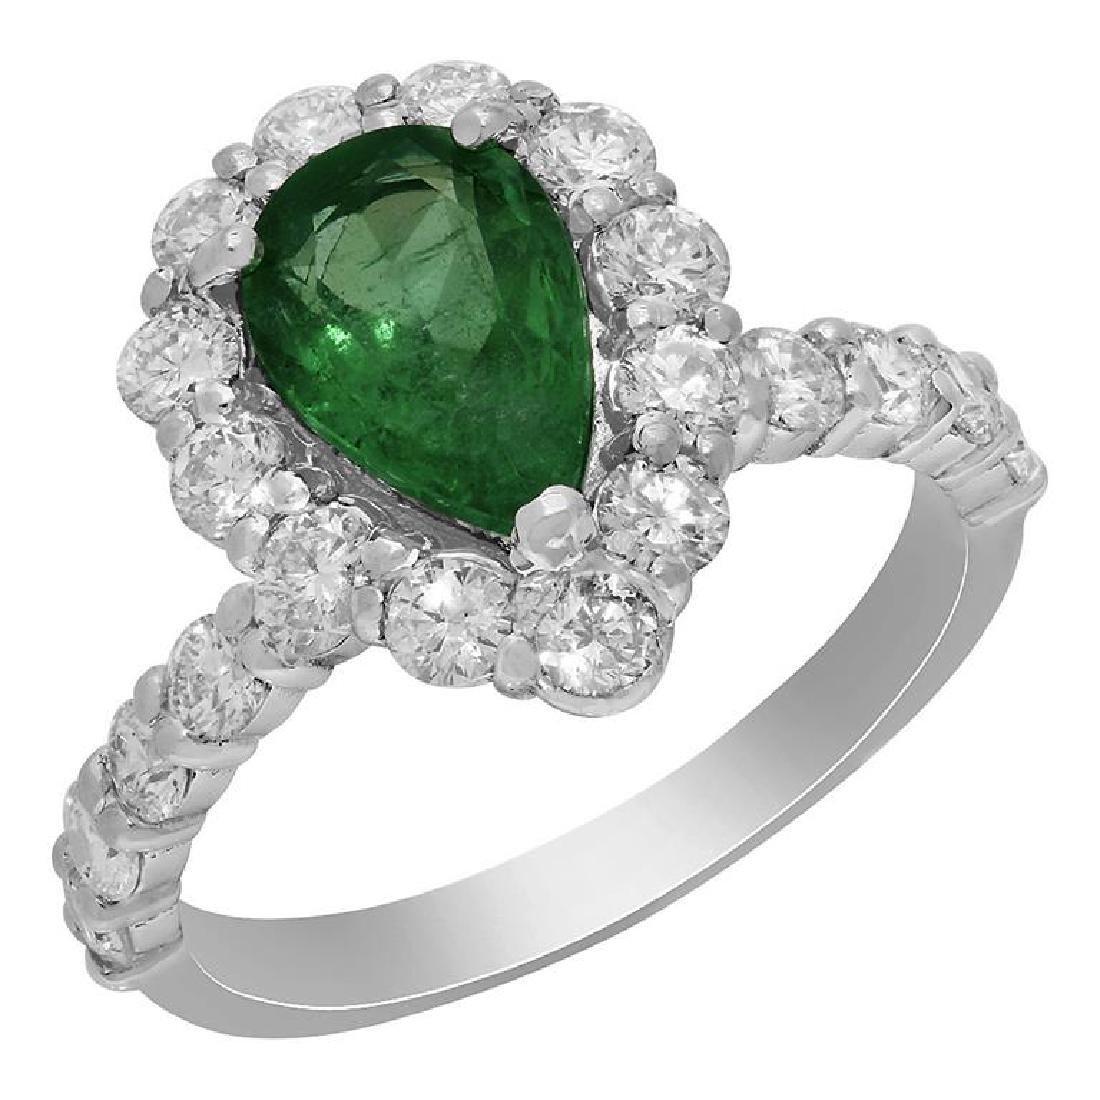 14k White Gold 1.59ct Emerald 1.49ct Diamond Ring